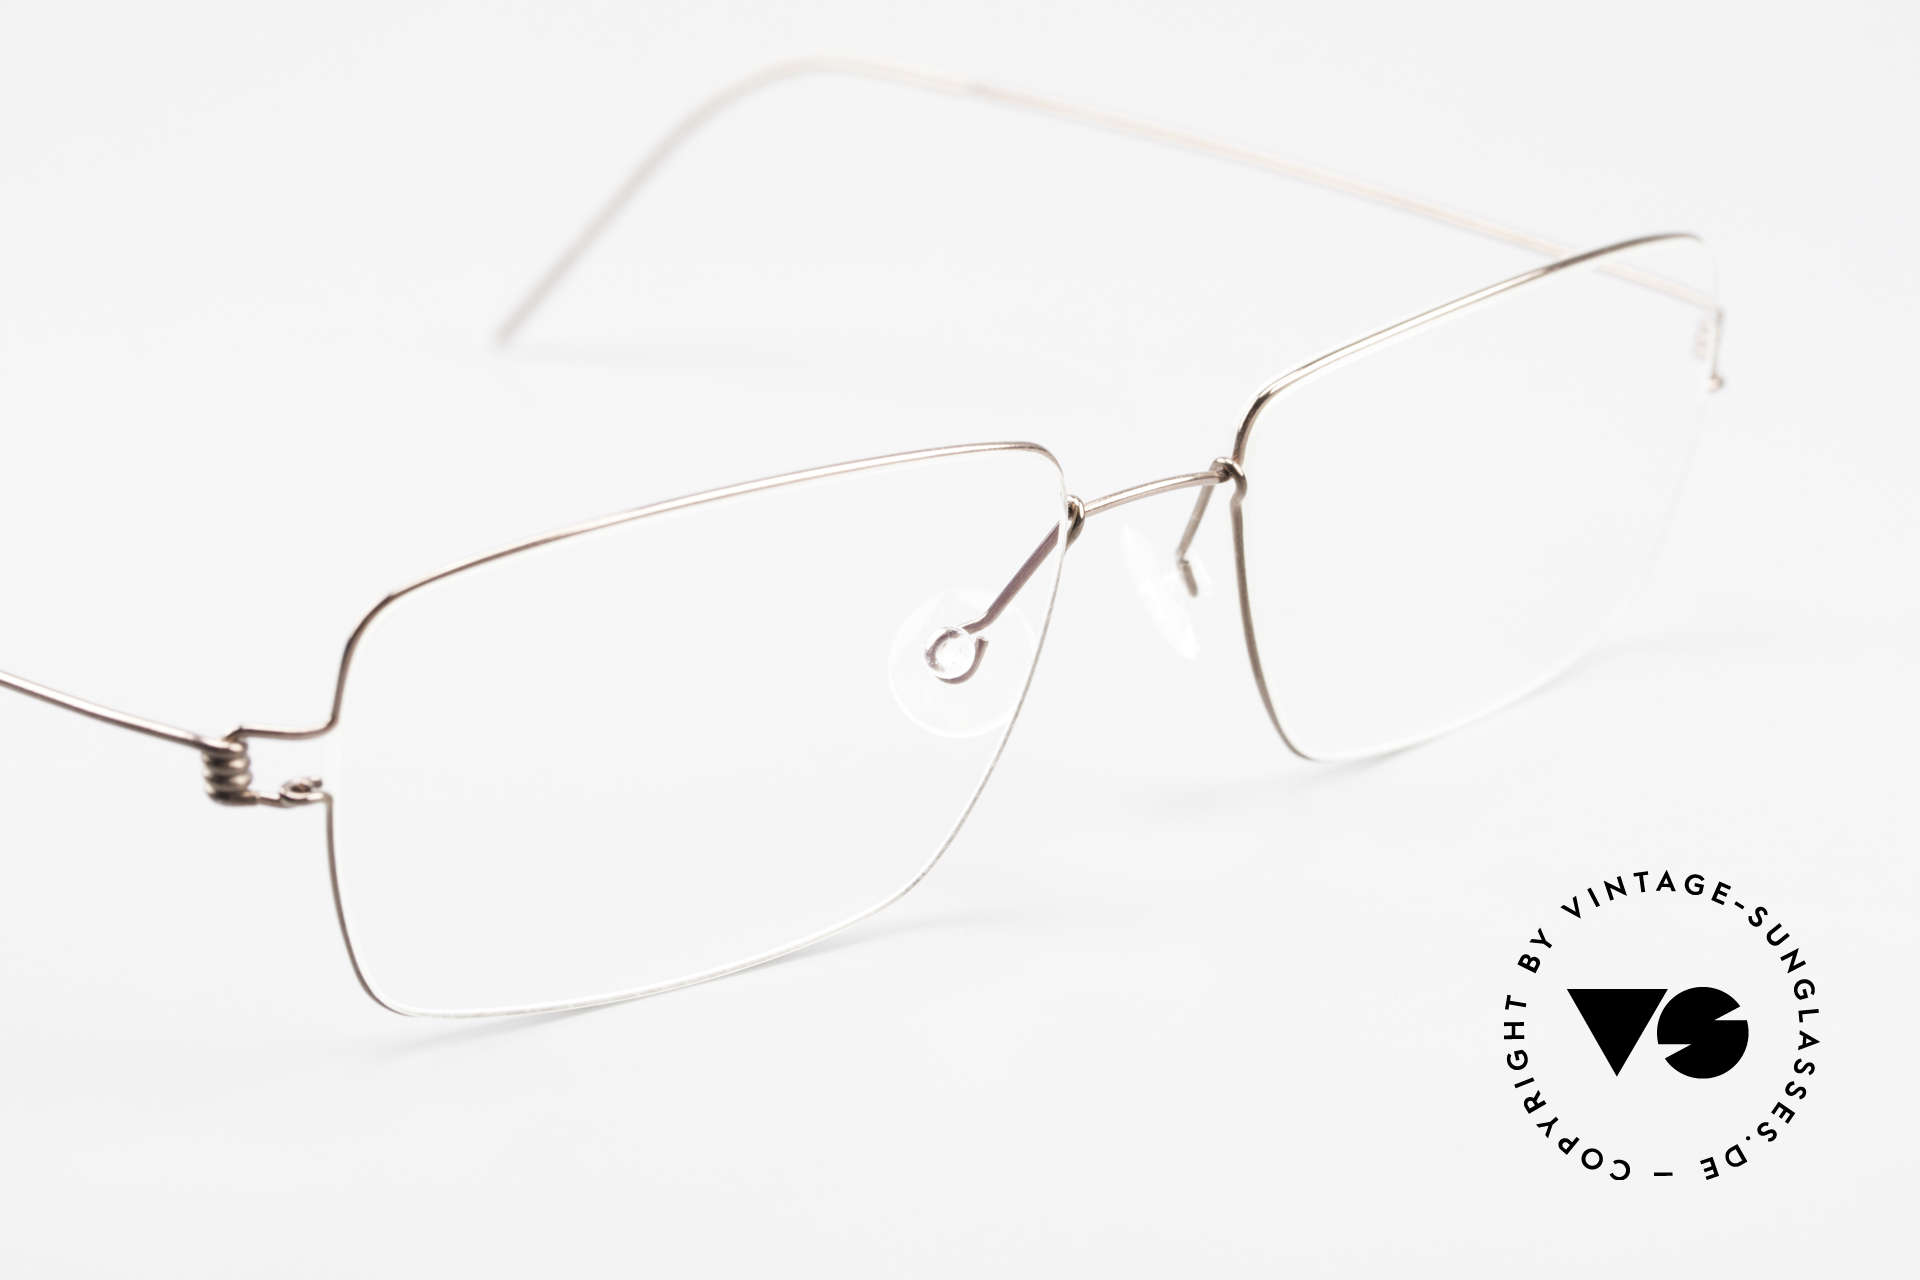 Lindberg Nikolaj Air Titan Rim High-End Titanium Herrenbrille, ungetragenes Designerstück + orig. Lindberg Magnet-Etui, Passend für Herren